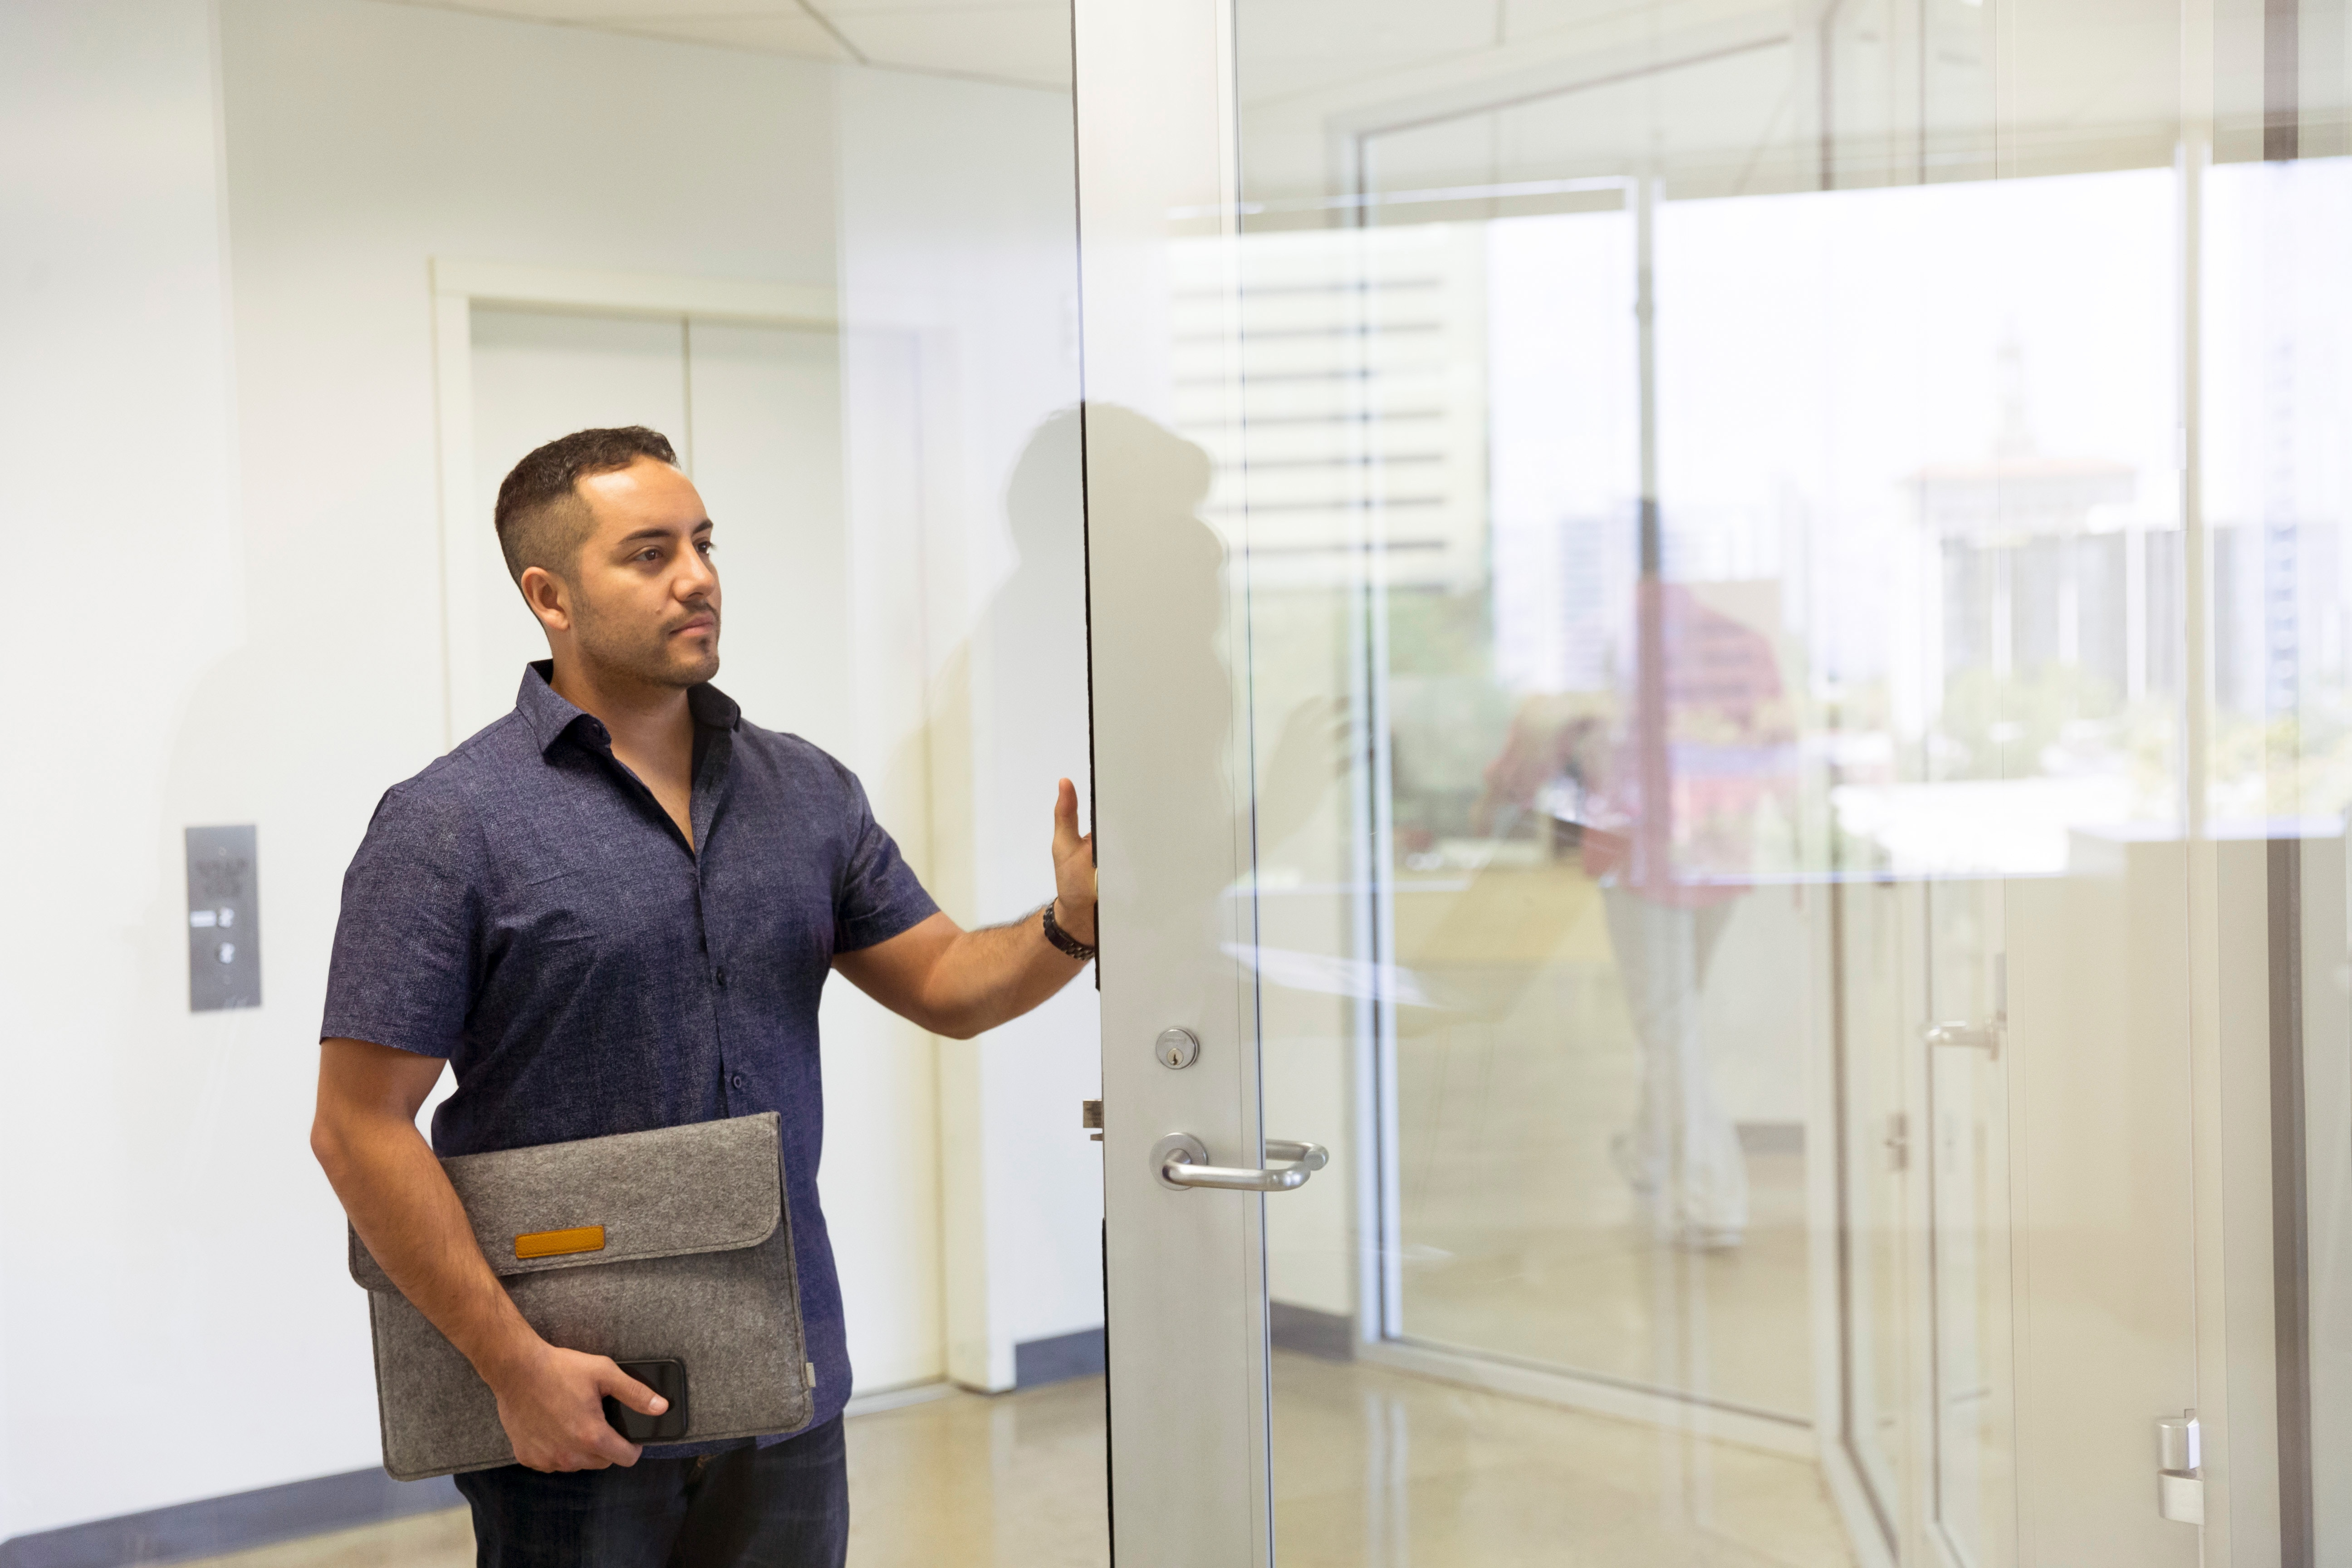 An employee opening a door, as if leaving a workplace. Image source: https://unsplash.com/photos/8nGuPyGkOMI